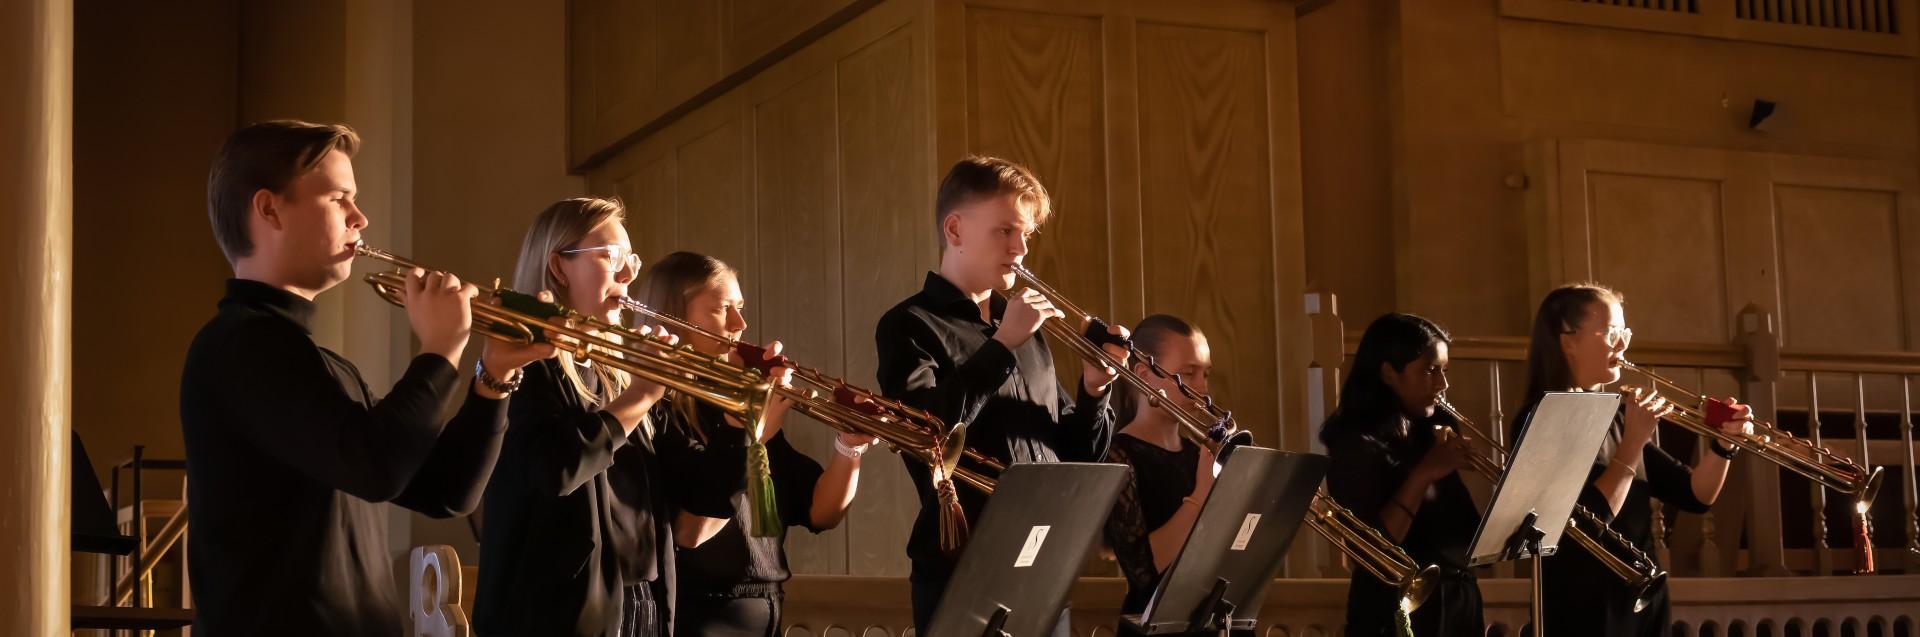 Bjergsted Brass Week 2021. Foto: Richard Herring